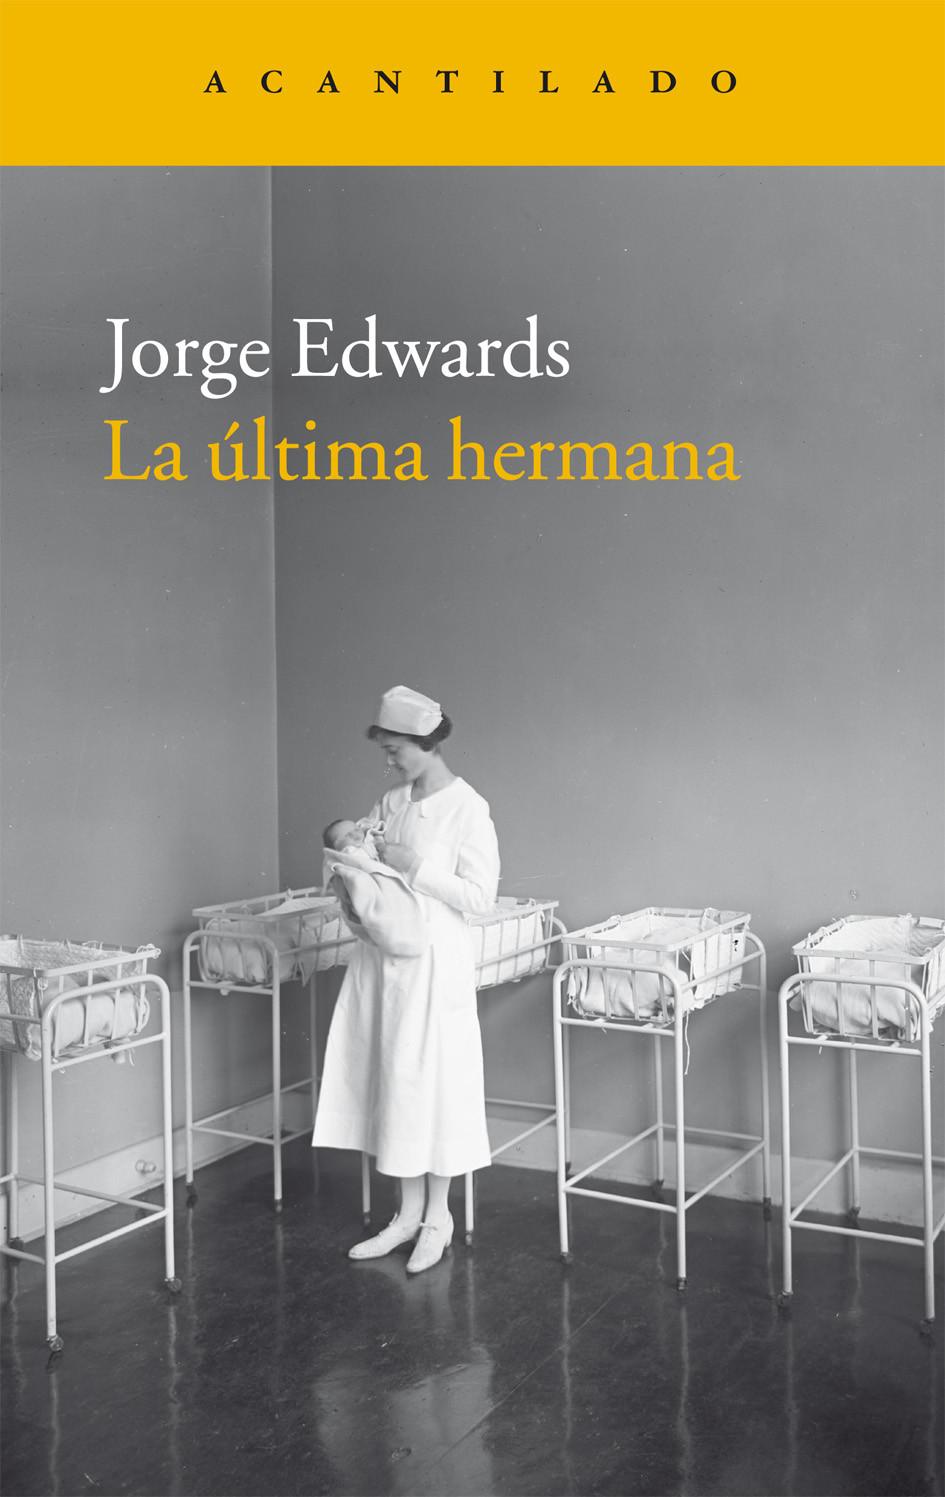 La última hermana, Jorge Edwards